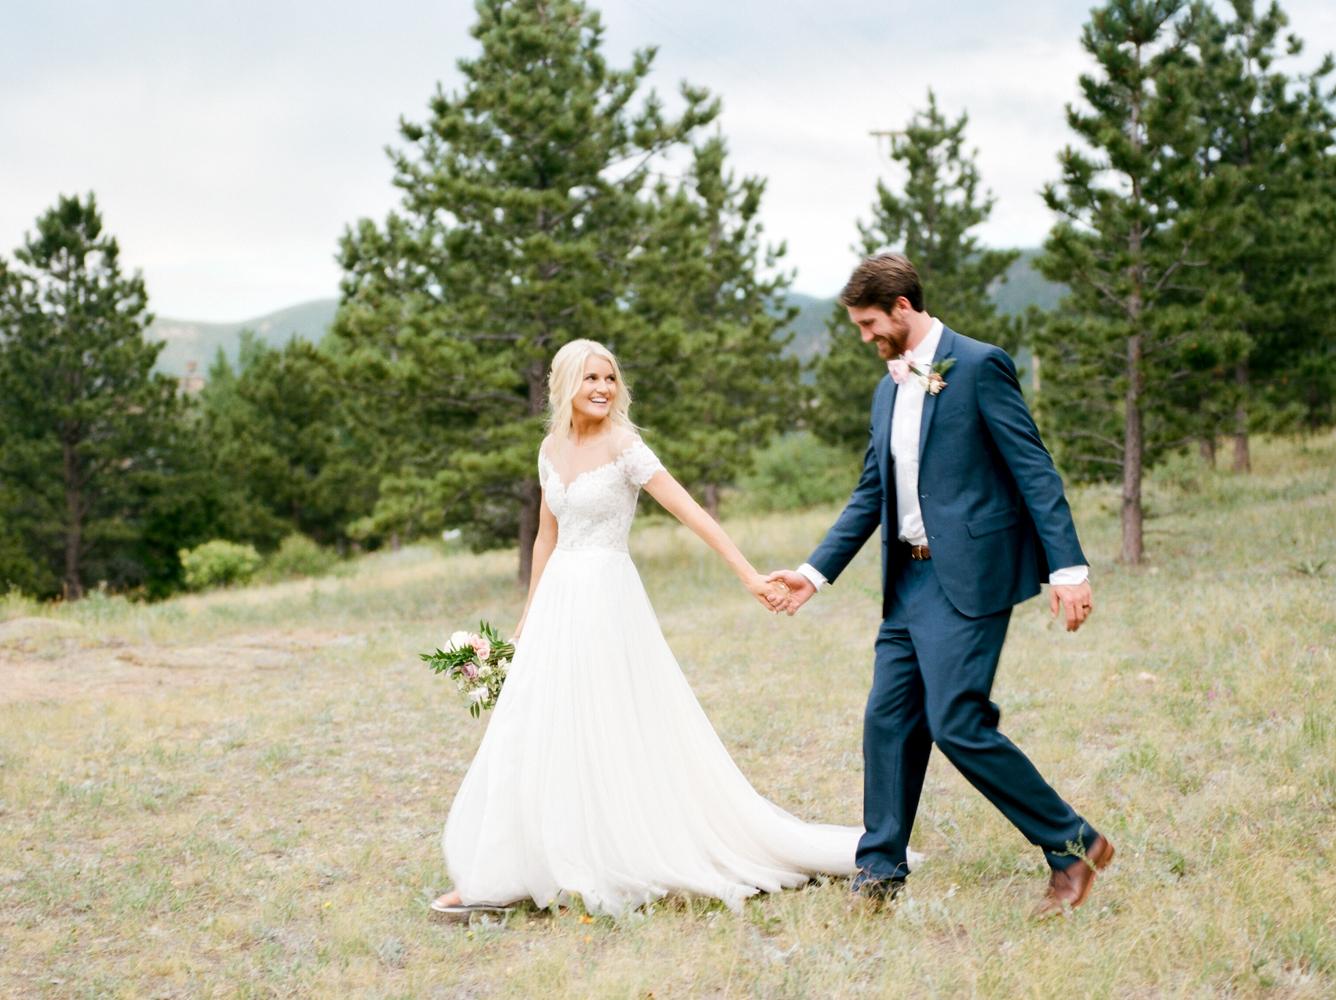 Bostick-Durham-Wedding-488.jpg